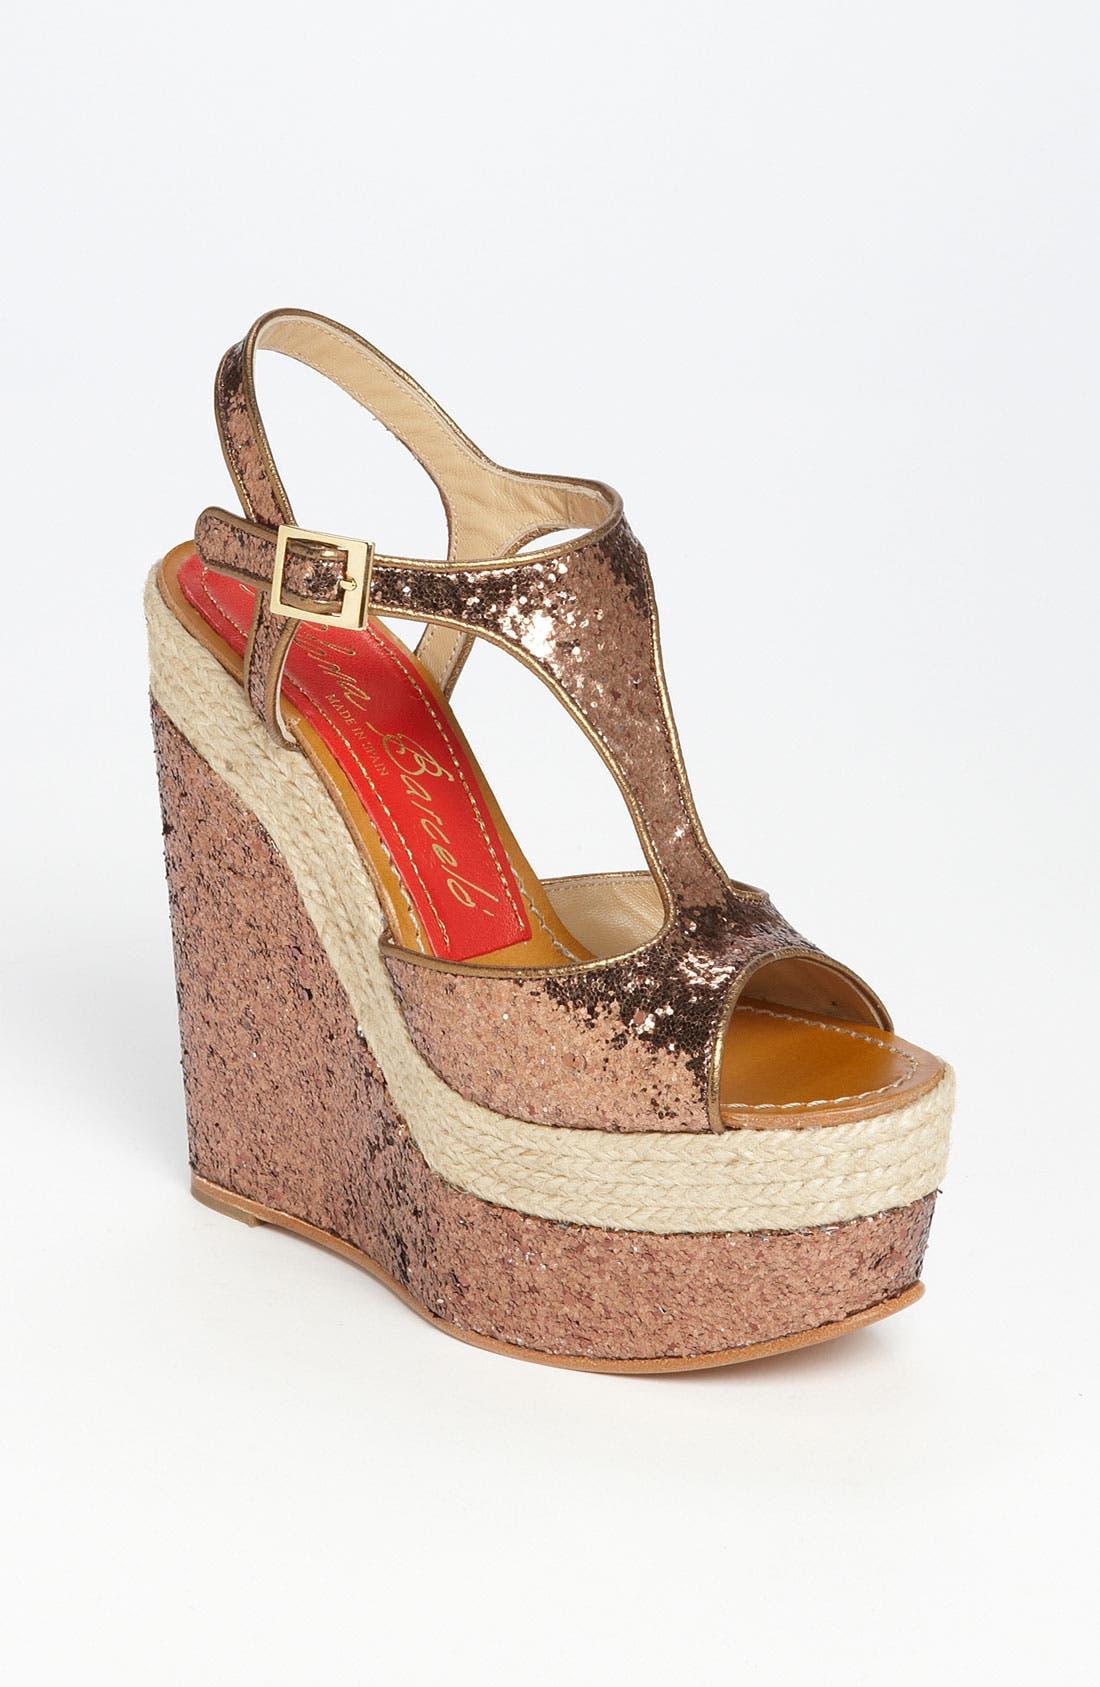 Alternate Image 1 Selected - Paloma Barcelo Sandal